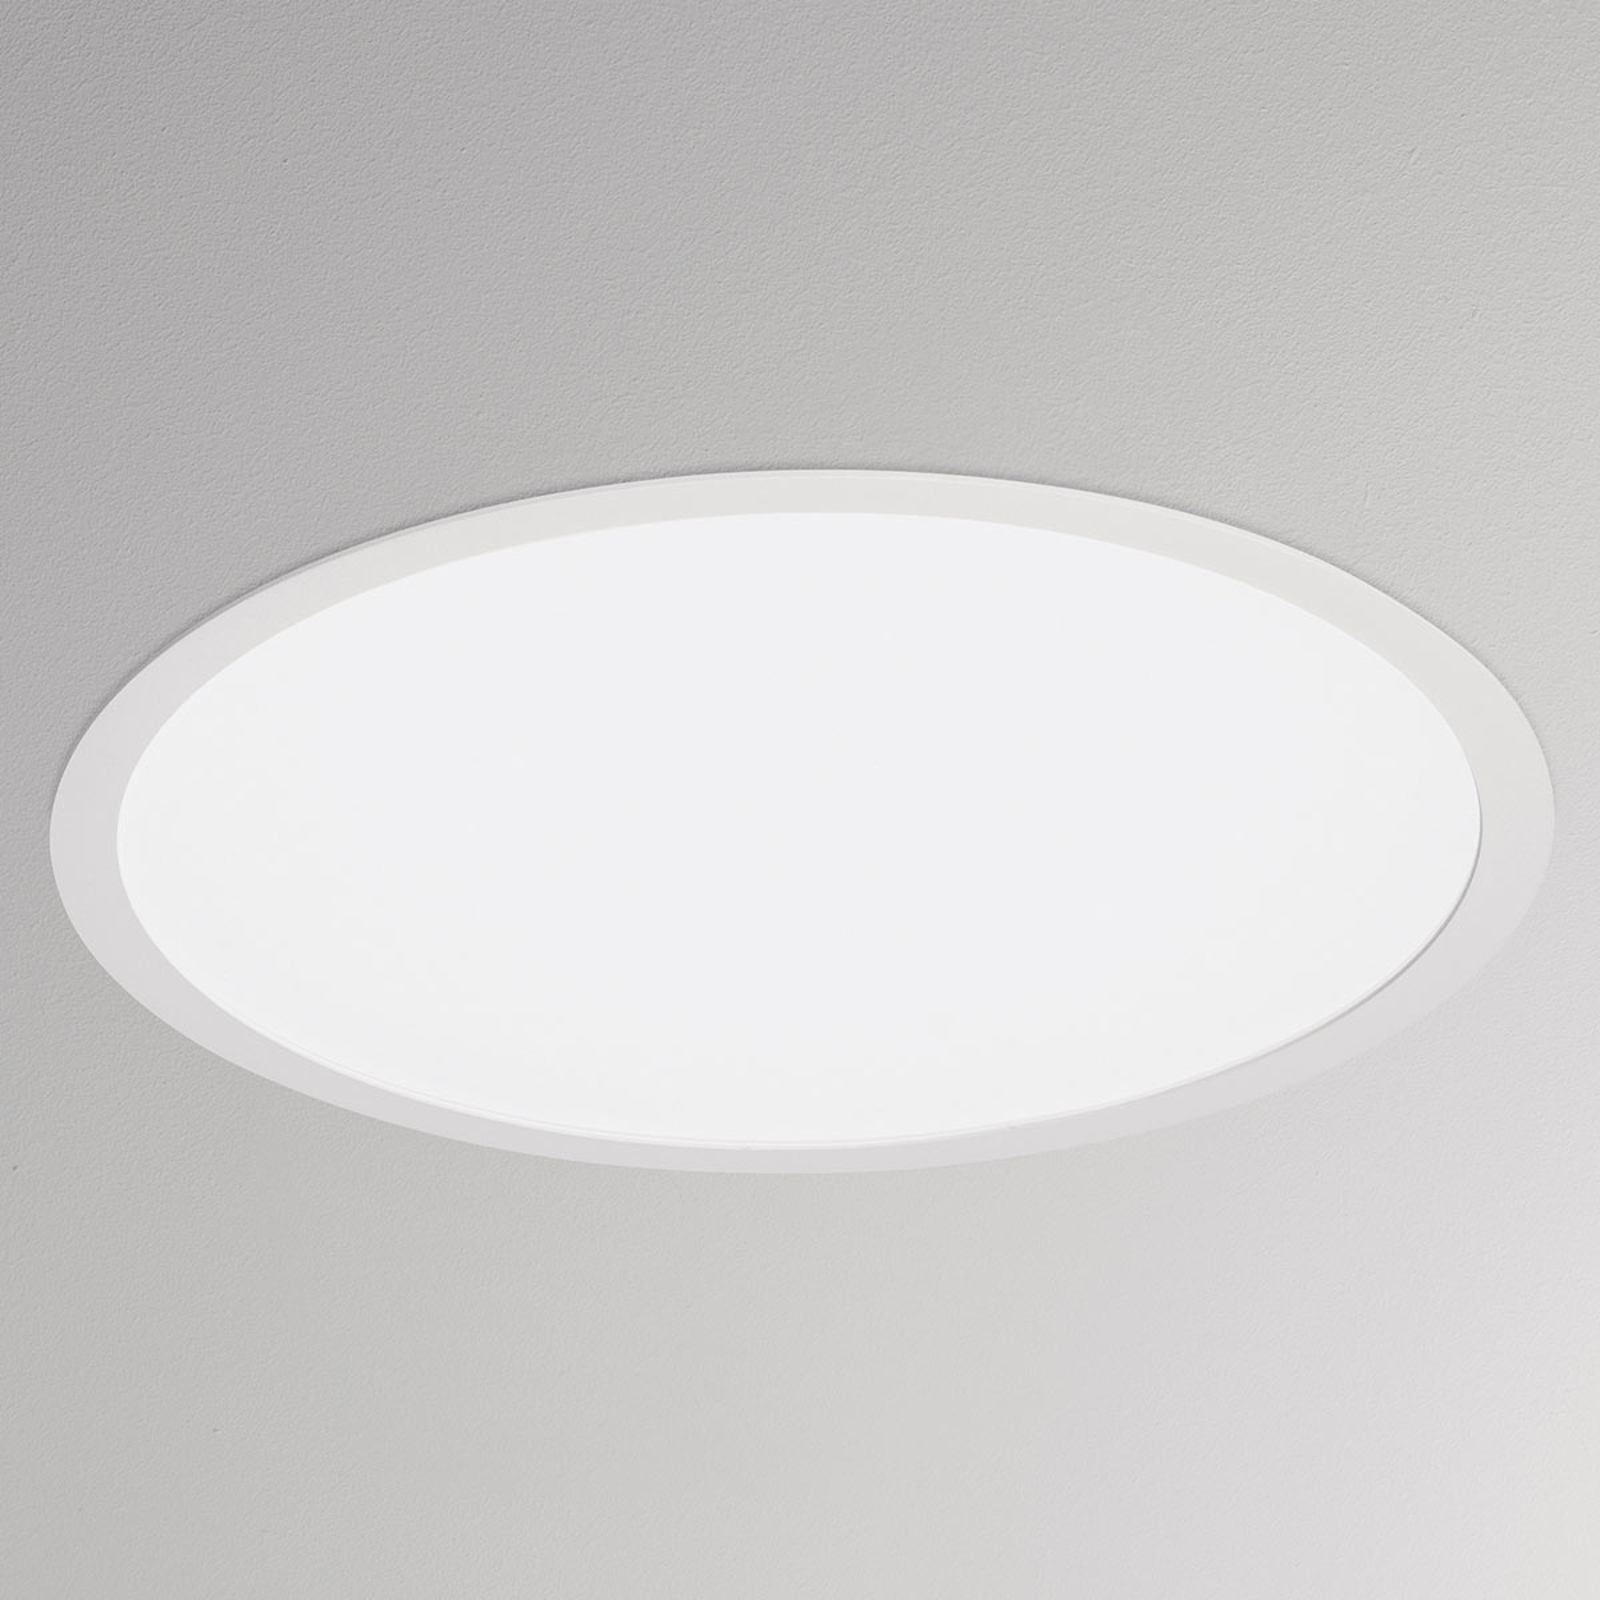 LED-Einbauleuchte Bado R, Ø 67 cm, 44 W, 3.000 K